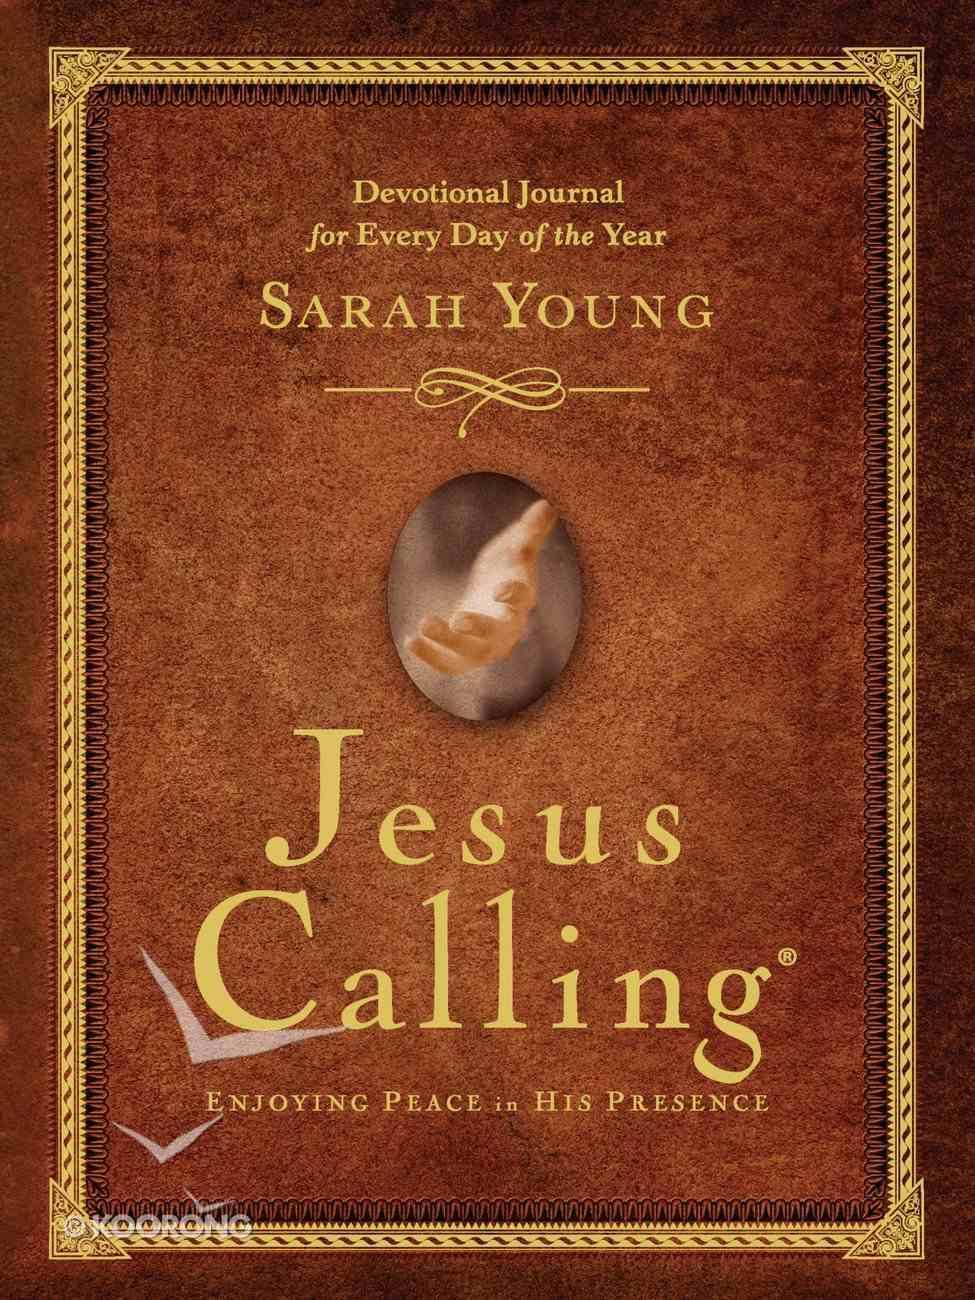 Jesus Calling: 365 Journaling Devotional eBook